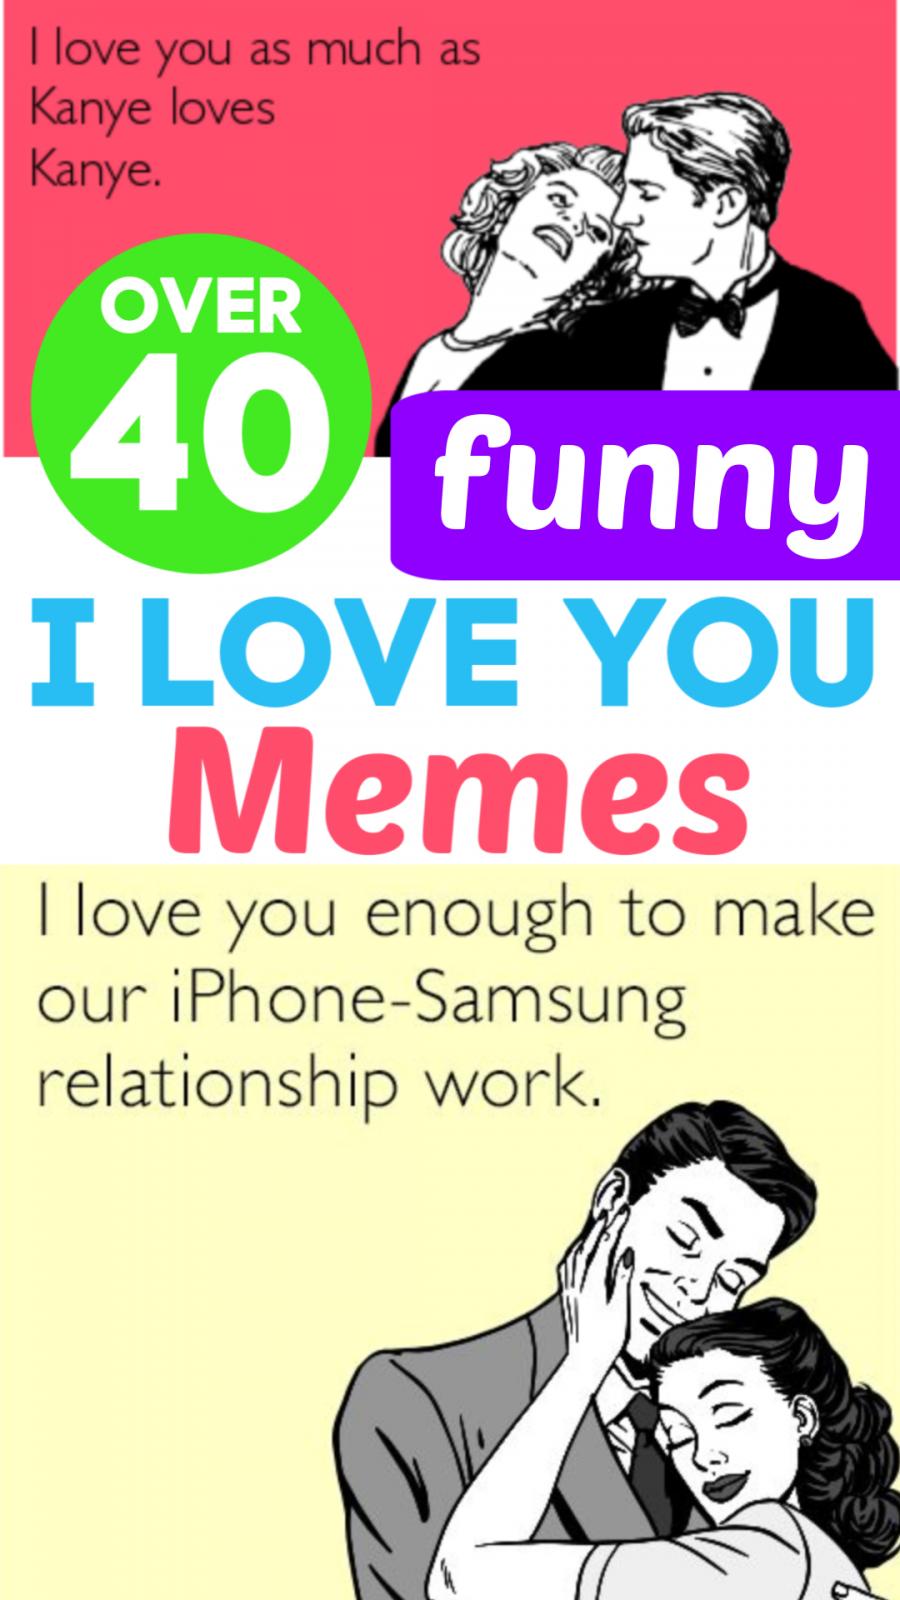 I Love You Memes For Him Funny : memes, funny, Funny, Memes!, Memes, Flirty, Sen…, Memes,, Meme,, Quotes